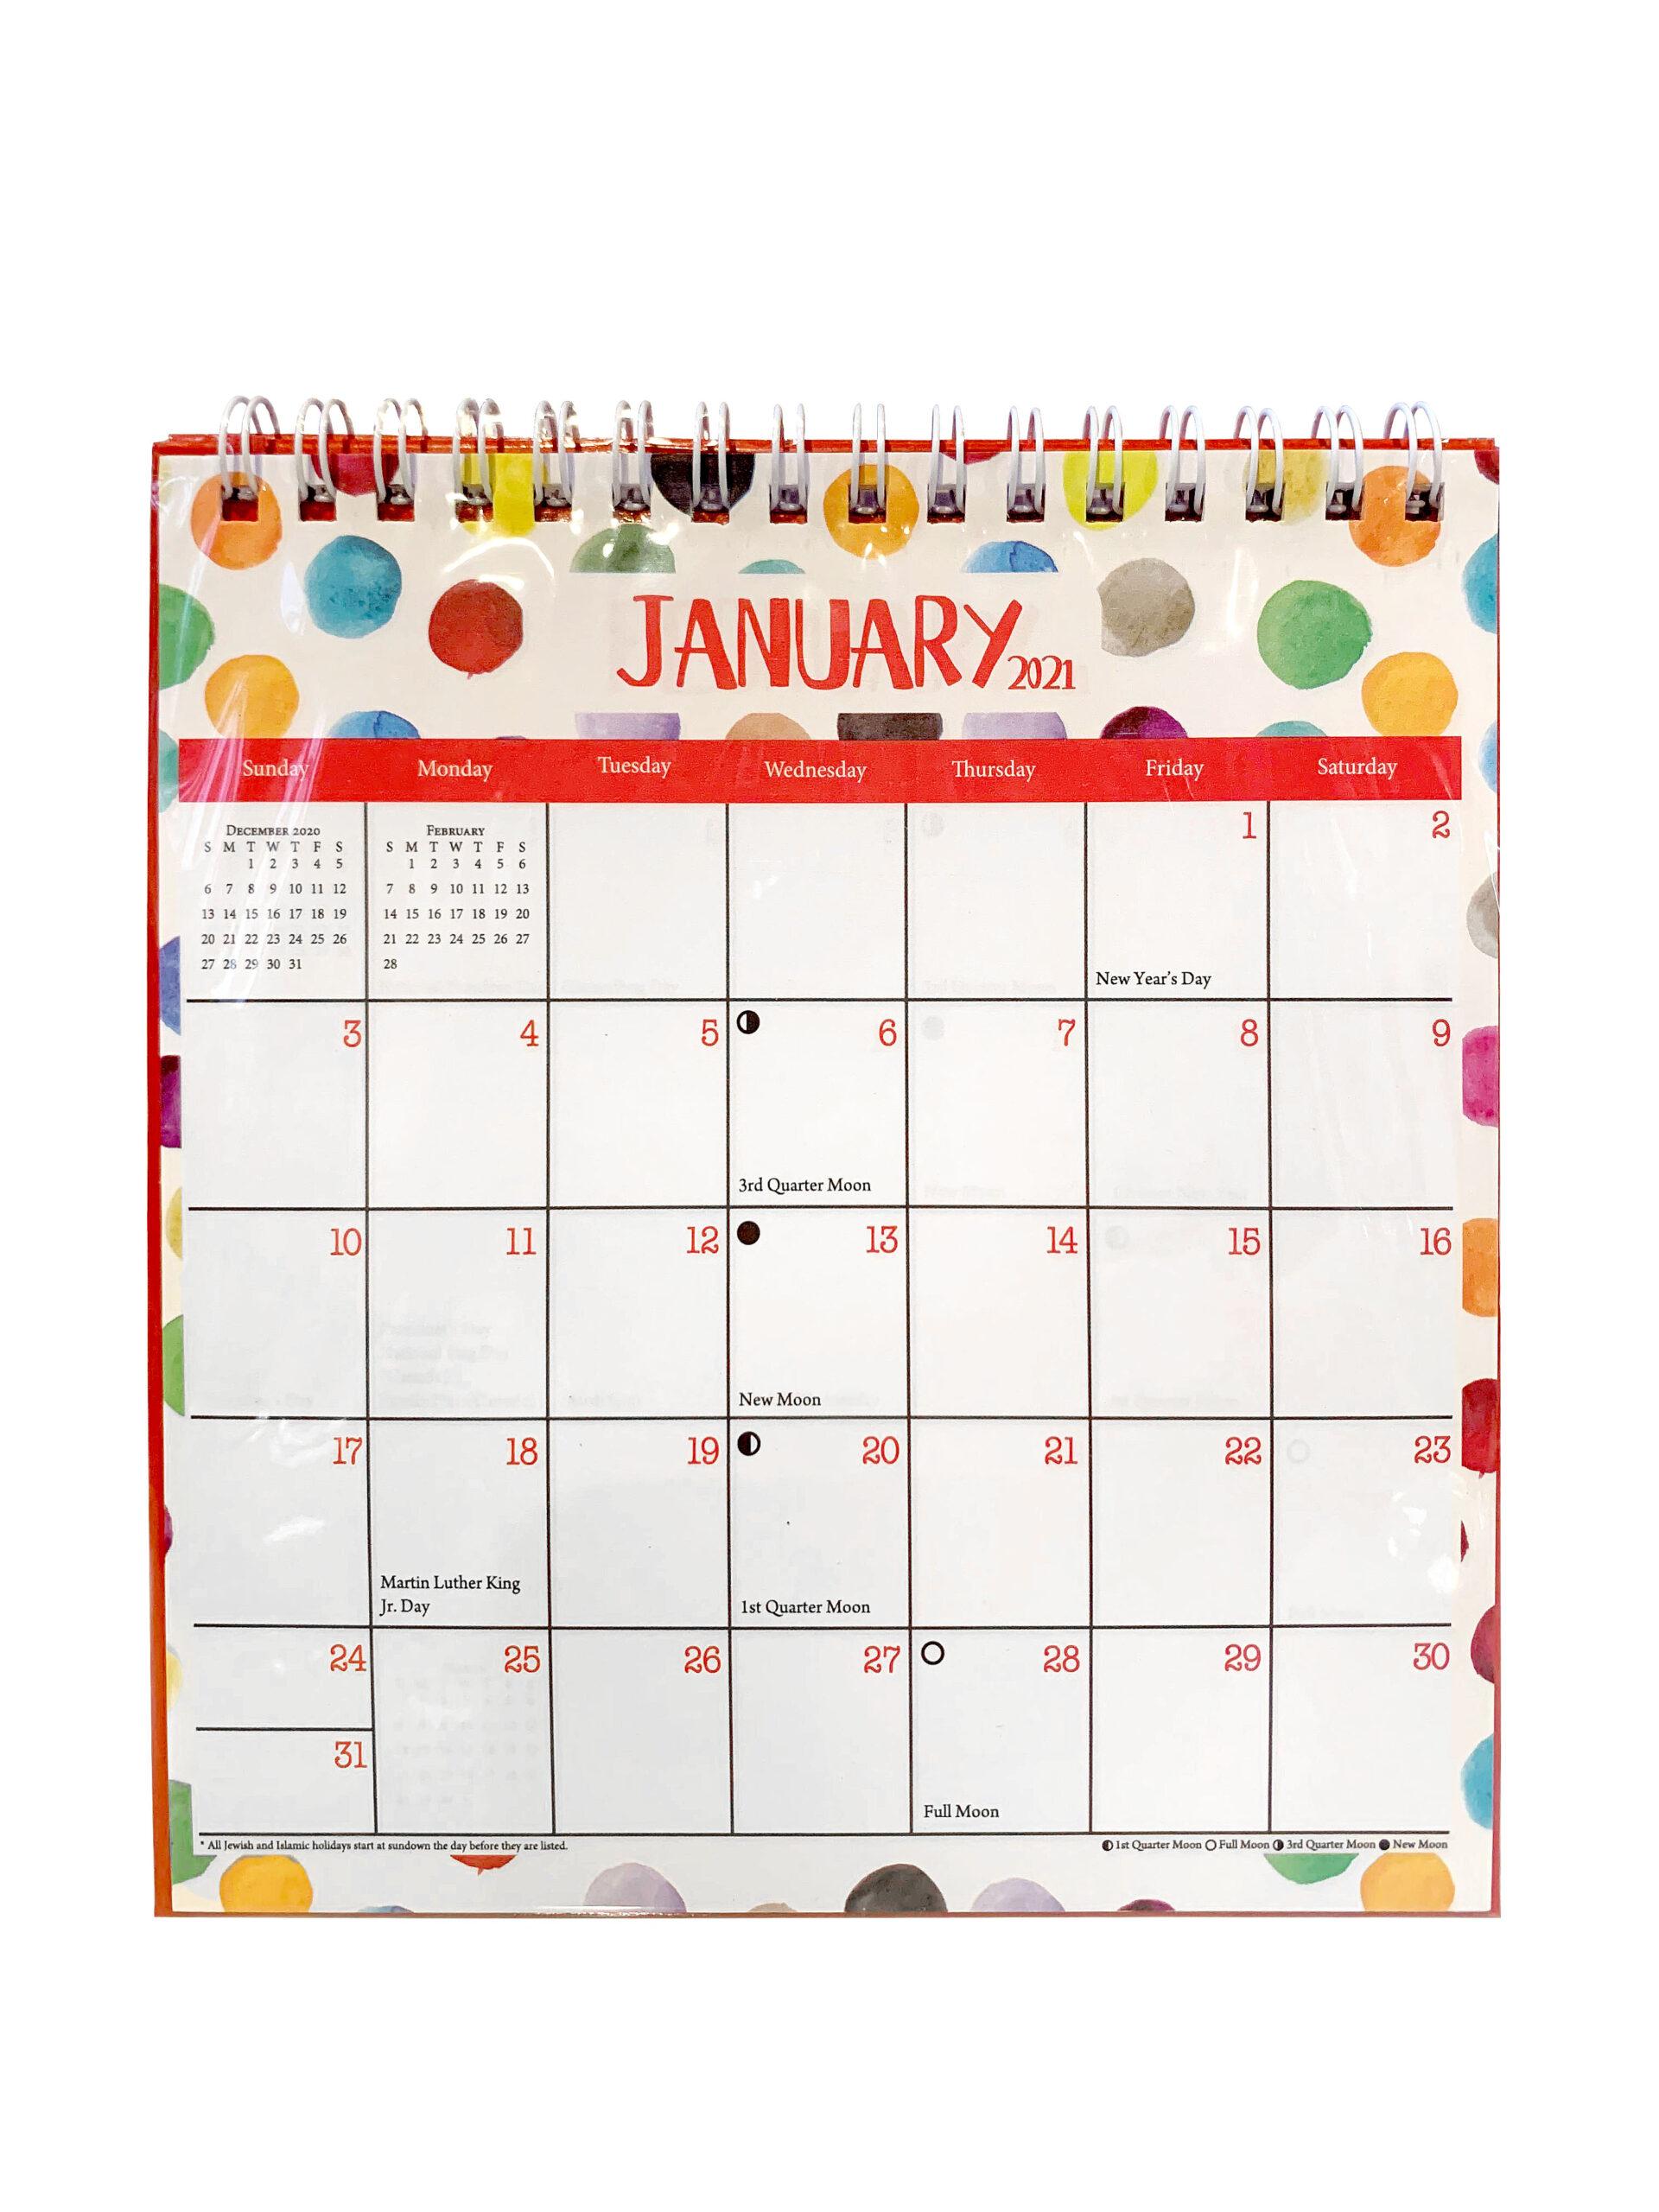 Desk Calendar For The Year 2021 Academic Desk Calendar Small Desk  Calendar Desk Pad Calendar Office Calendar Deskwall Calendar Large  Monthly